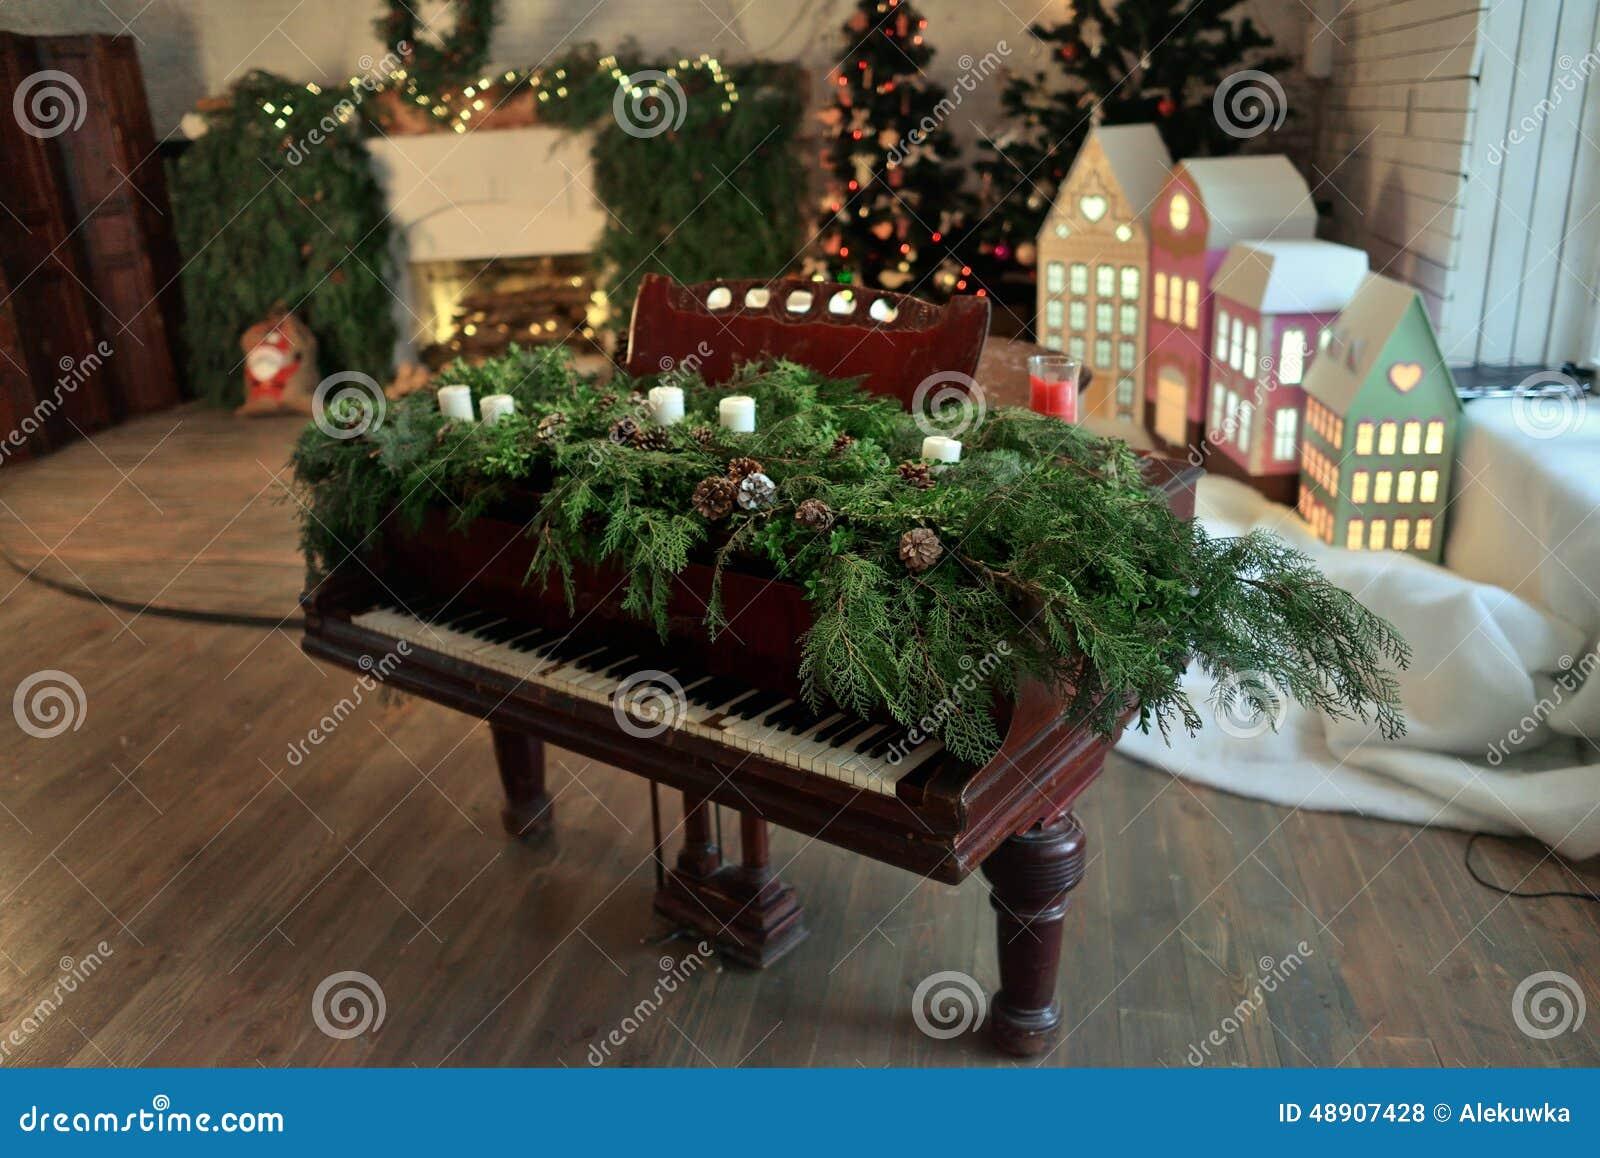 Decorating Ideas > Christmas Piano Stock Photo  Image 48907428 ~ 062026_Christmas Decoration Ideas Piano